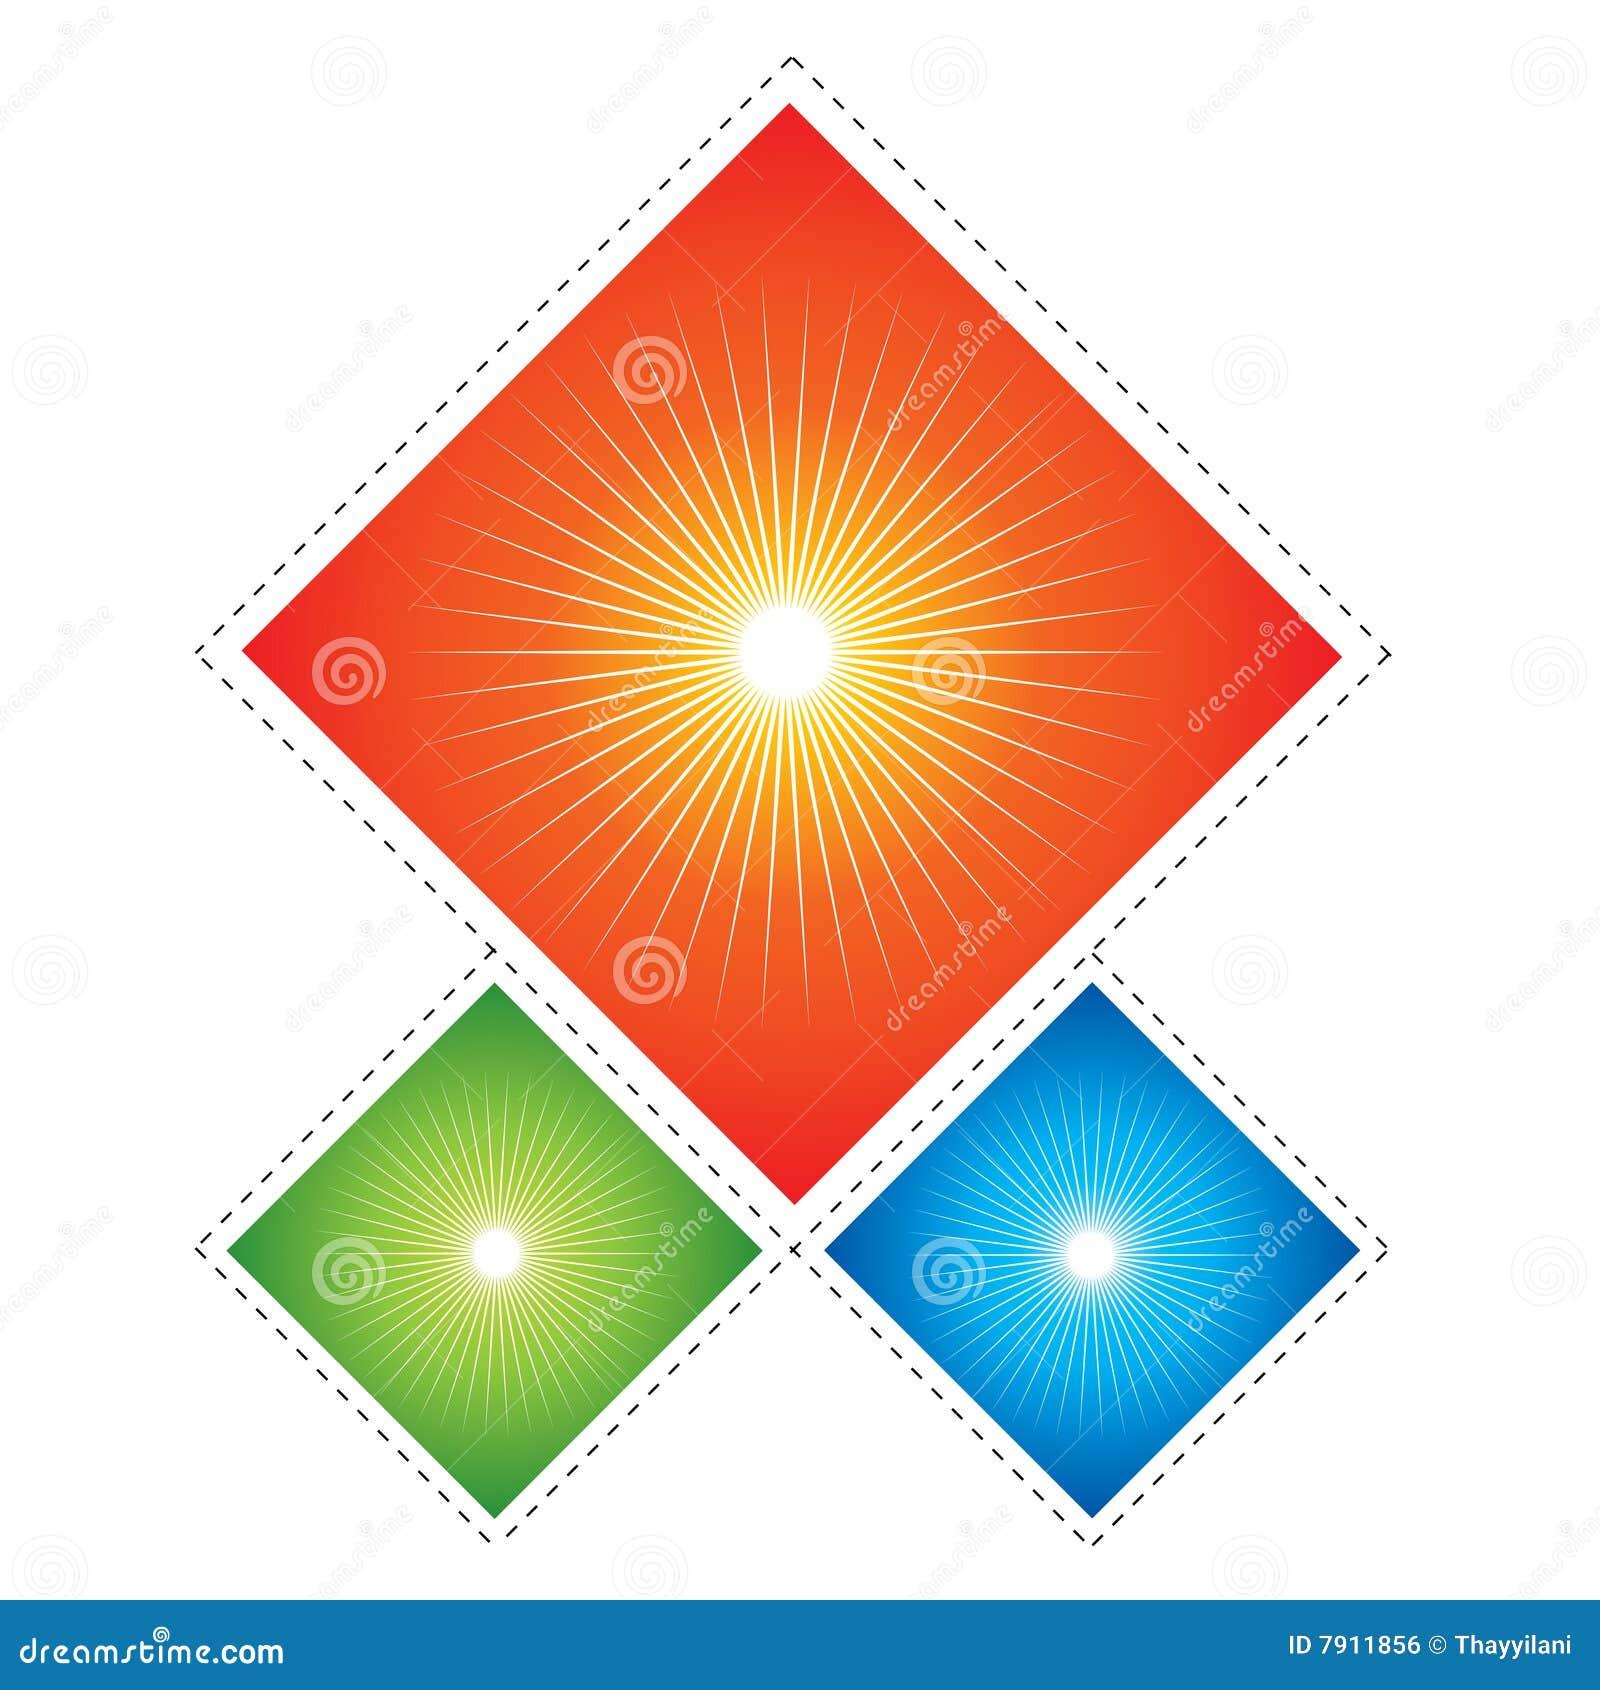 kite shaped dangler royalty free stock image image 7911856